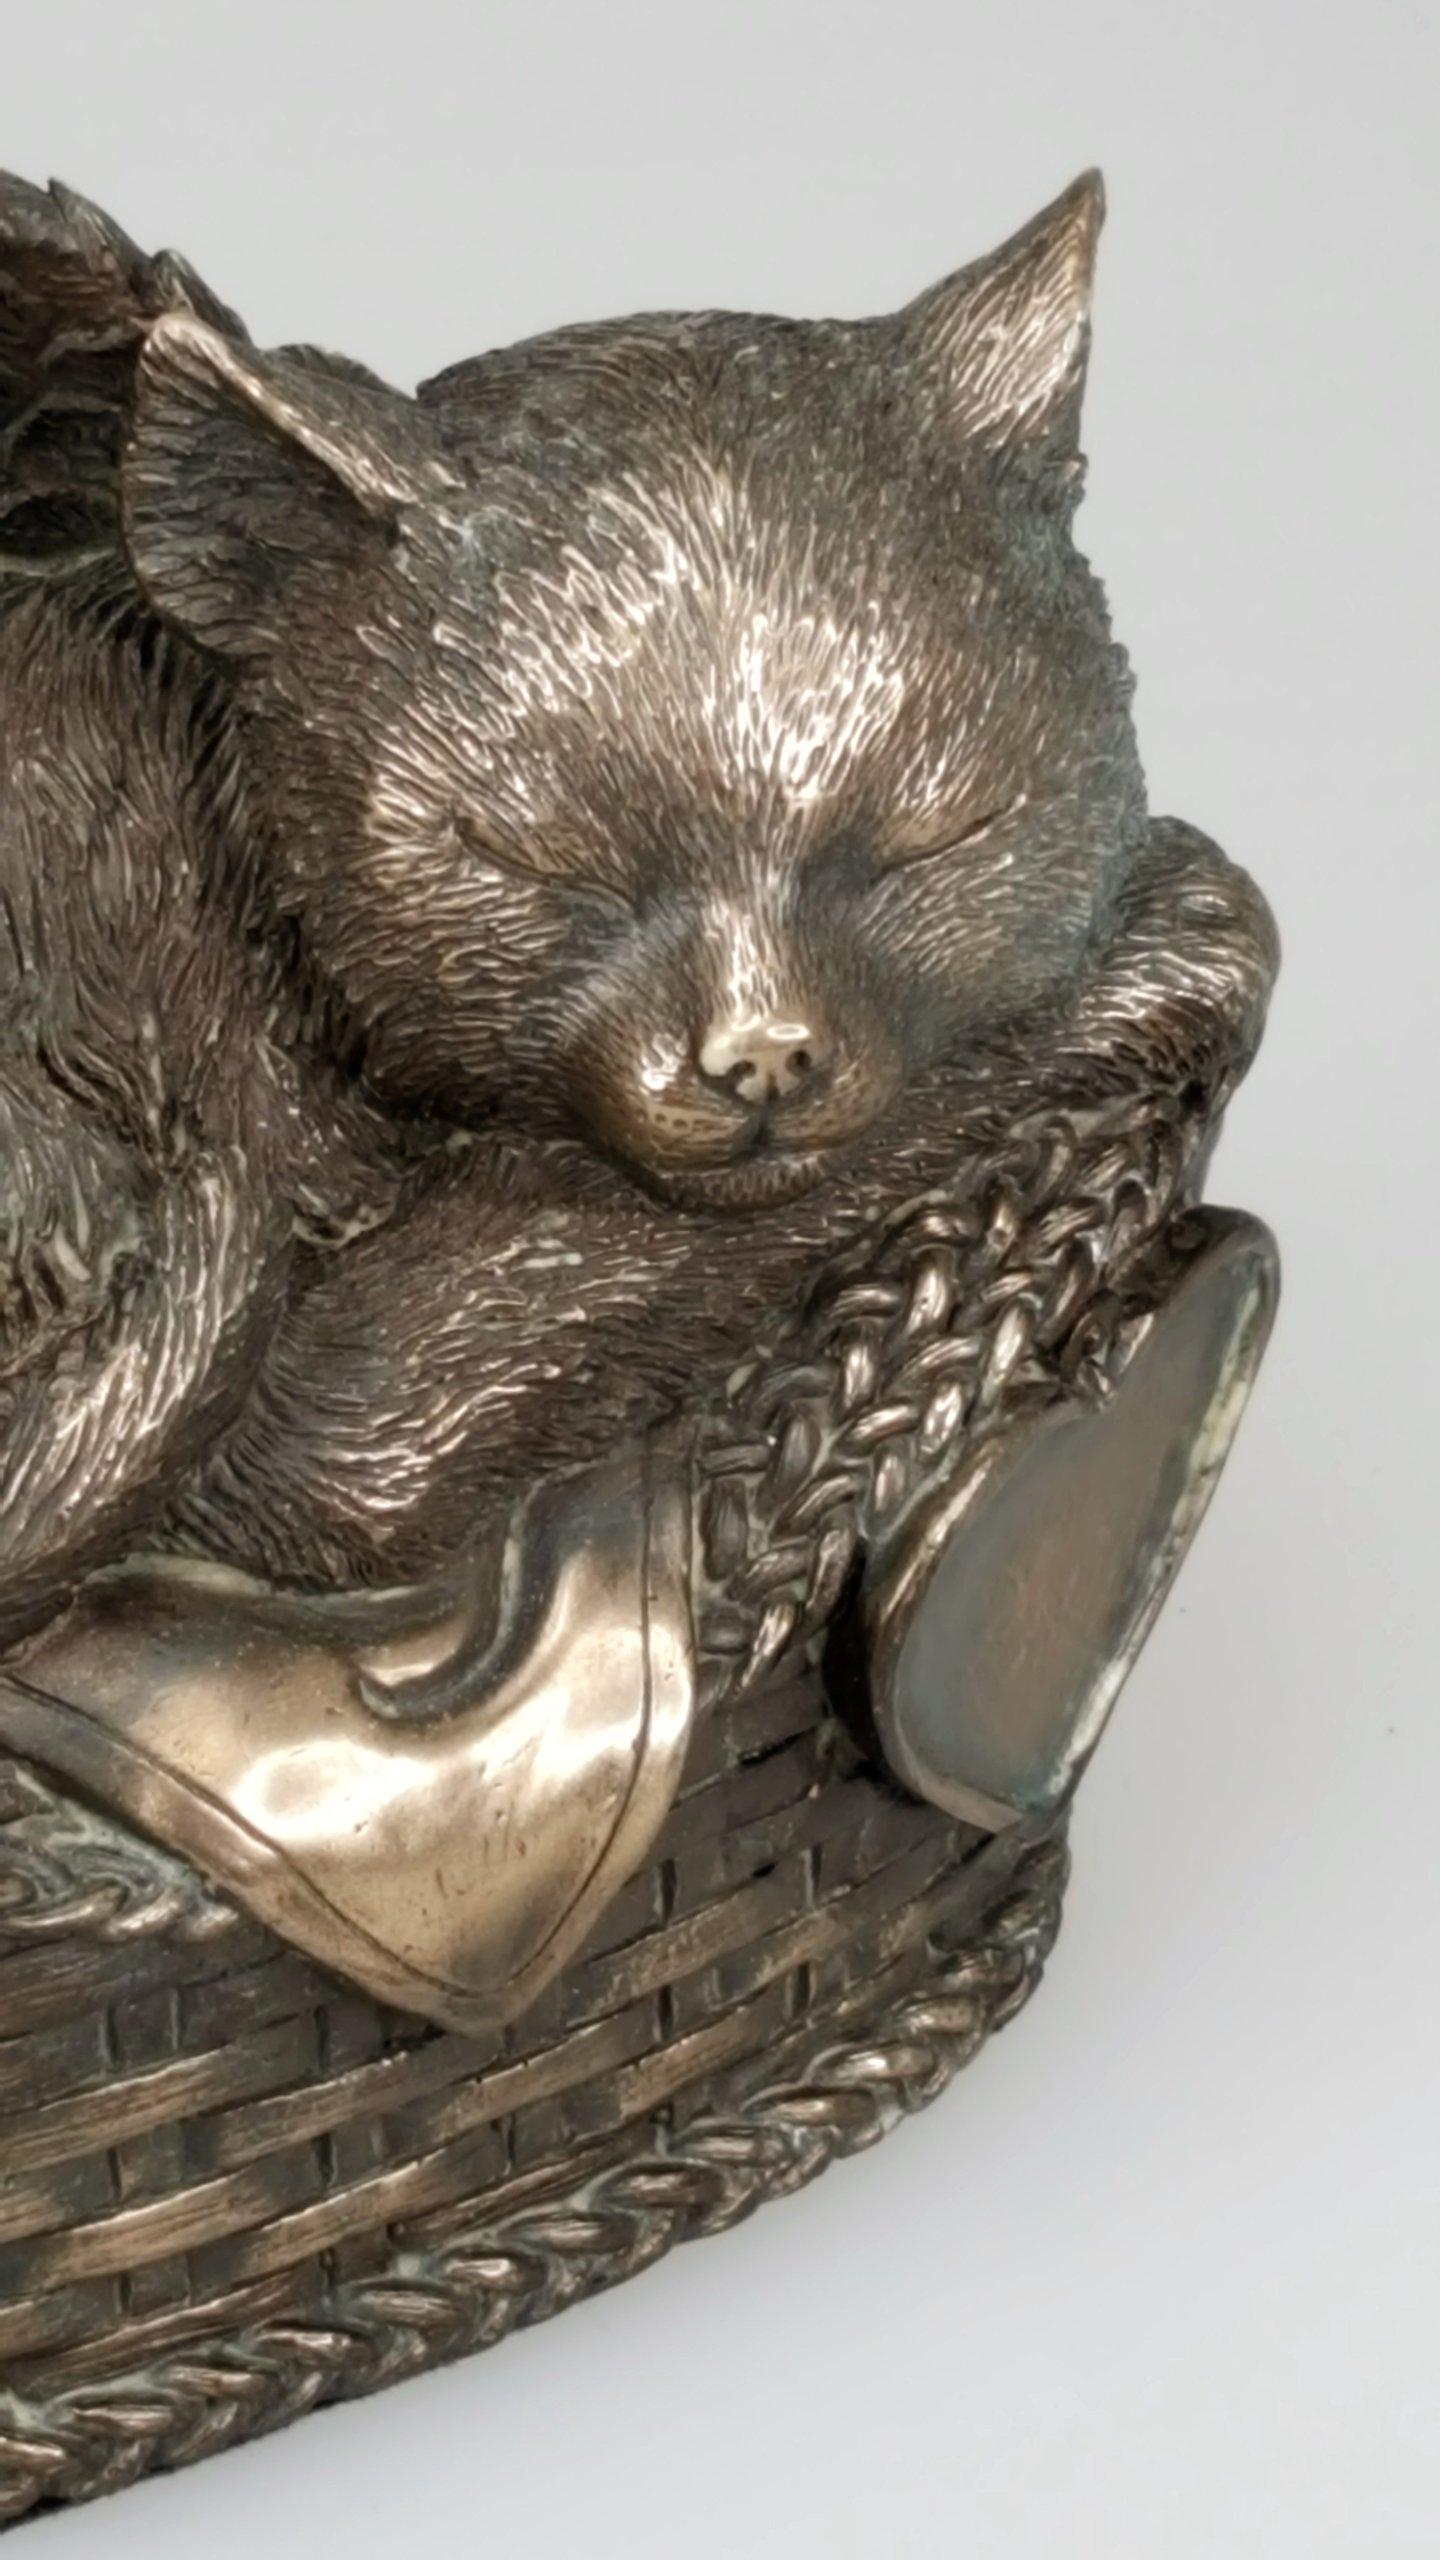 Windhaven Urns Pet Memorial Angel Cat Sleeping in Basket Cremation Urn Bronze Finish Bottom Load 30 Cubic Inch